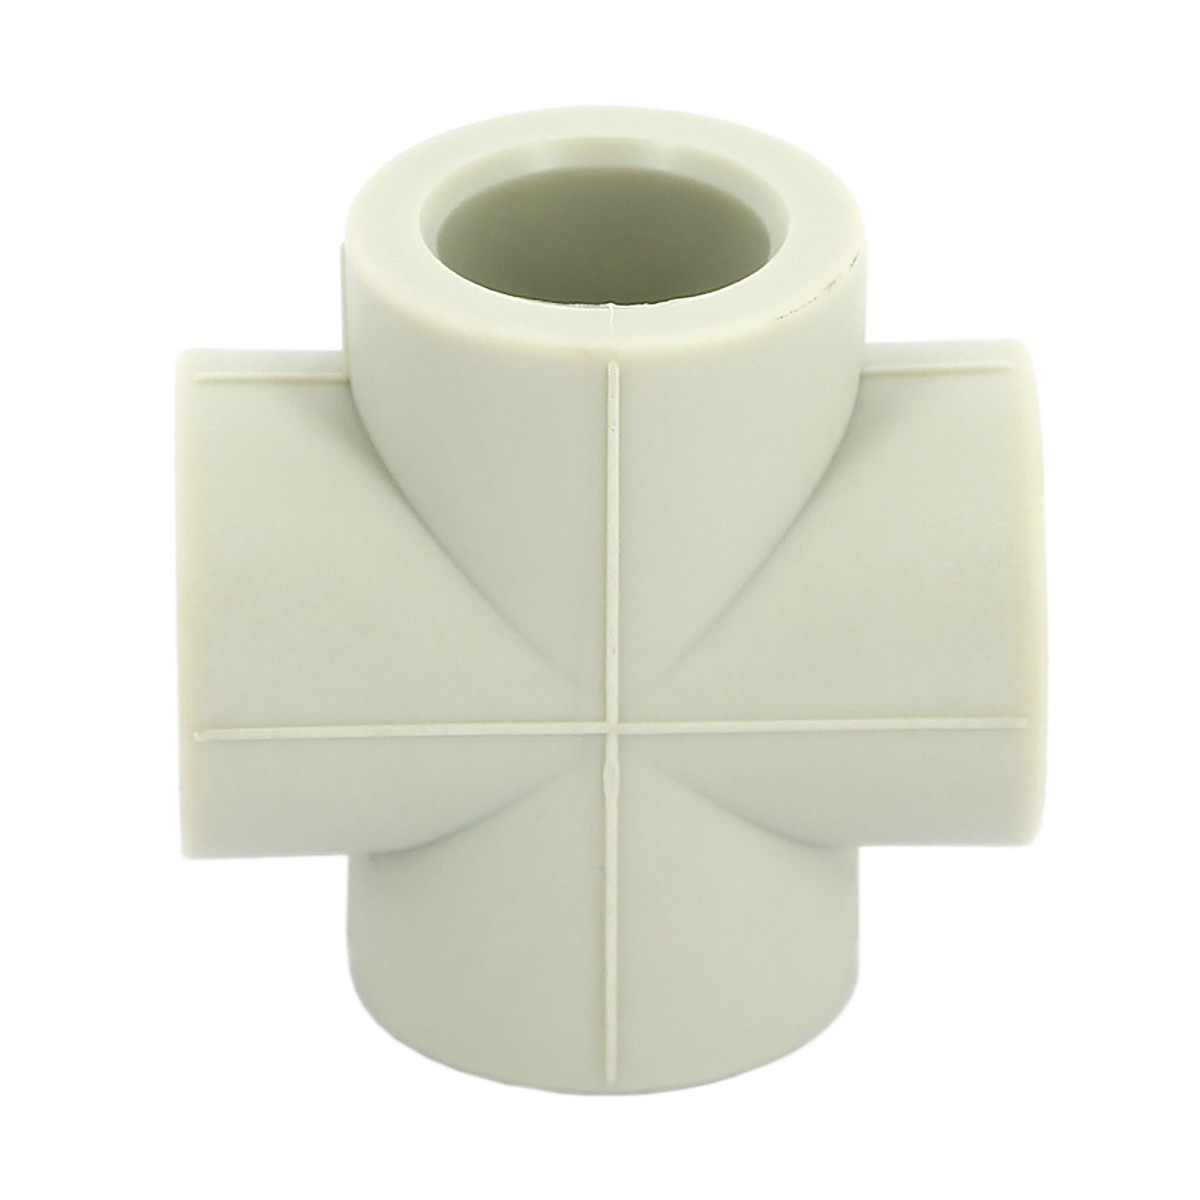 Крестовина ⌀20 Fv-Plast Полипропилен